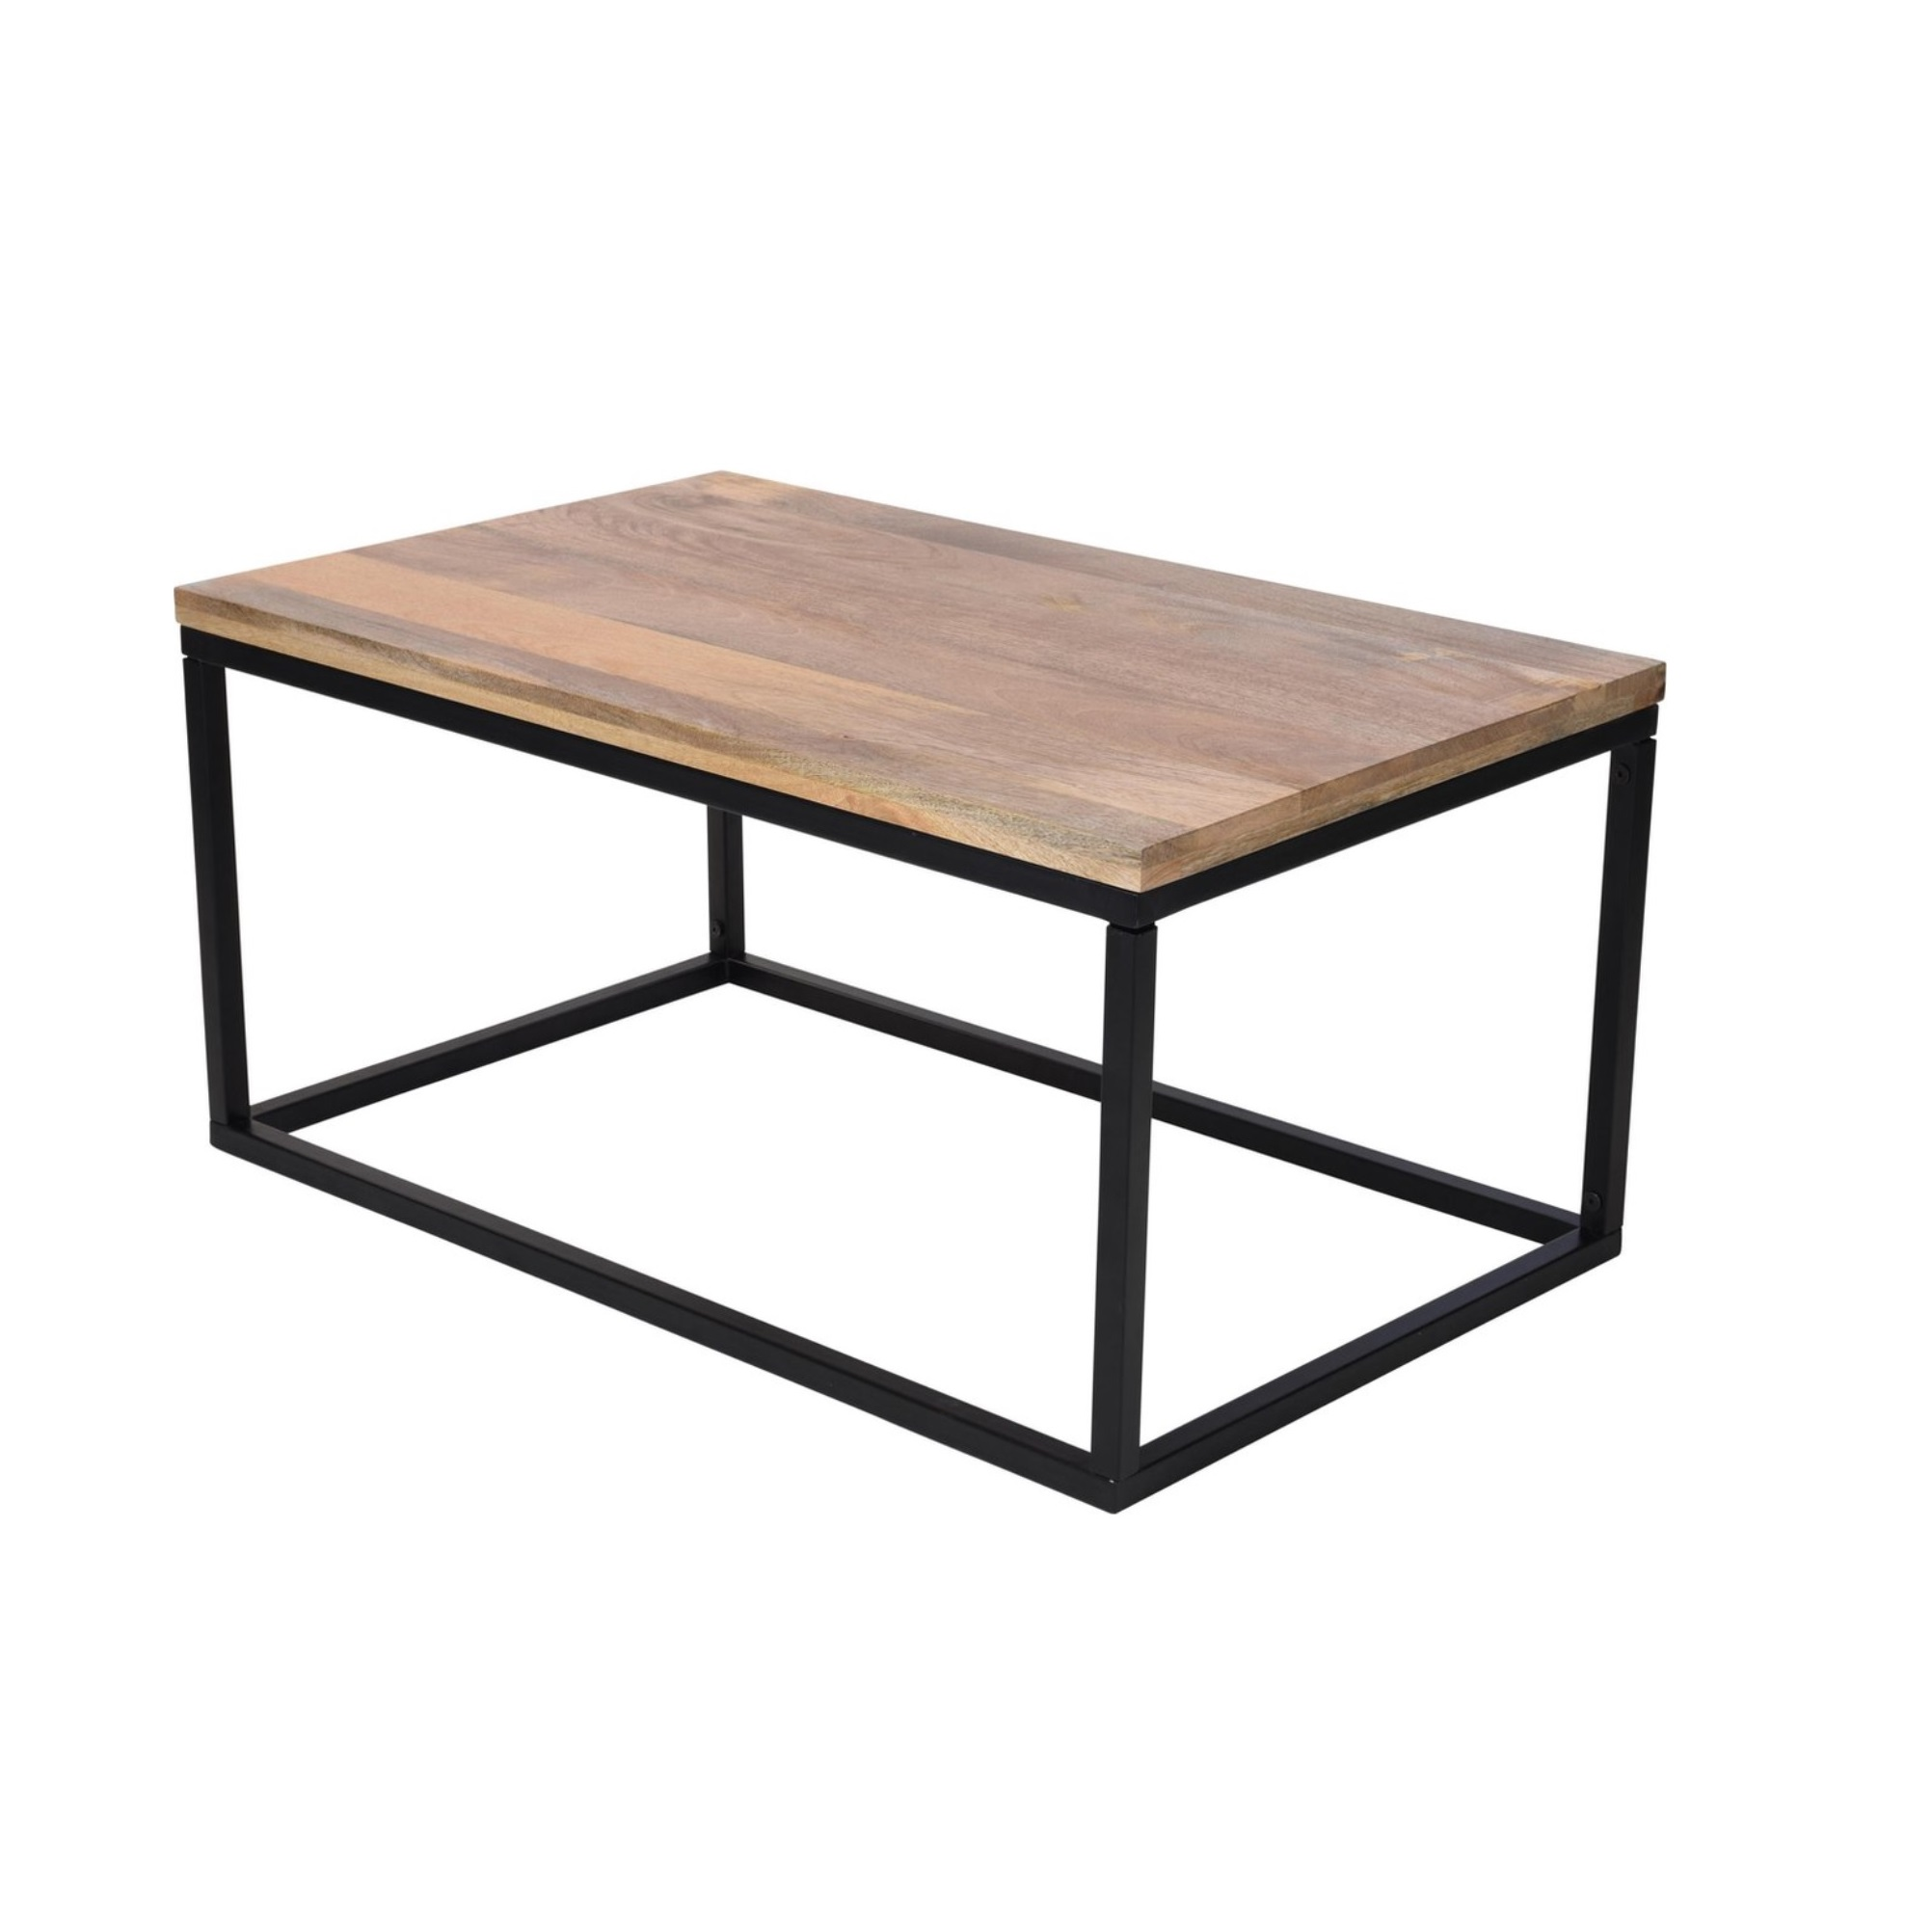 Стол на металлических ножках Koopman furniture 100x60x48 см